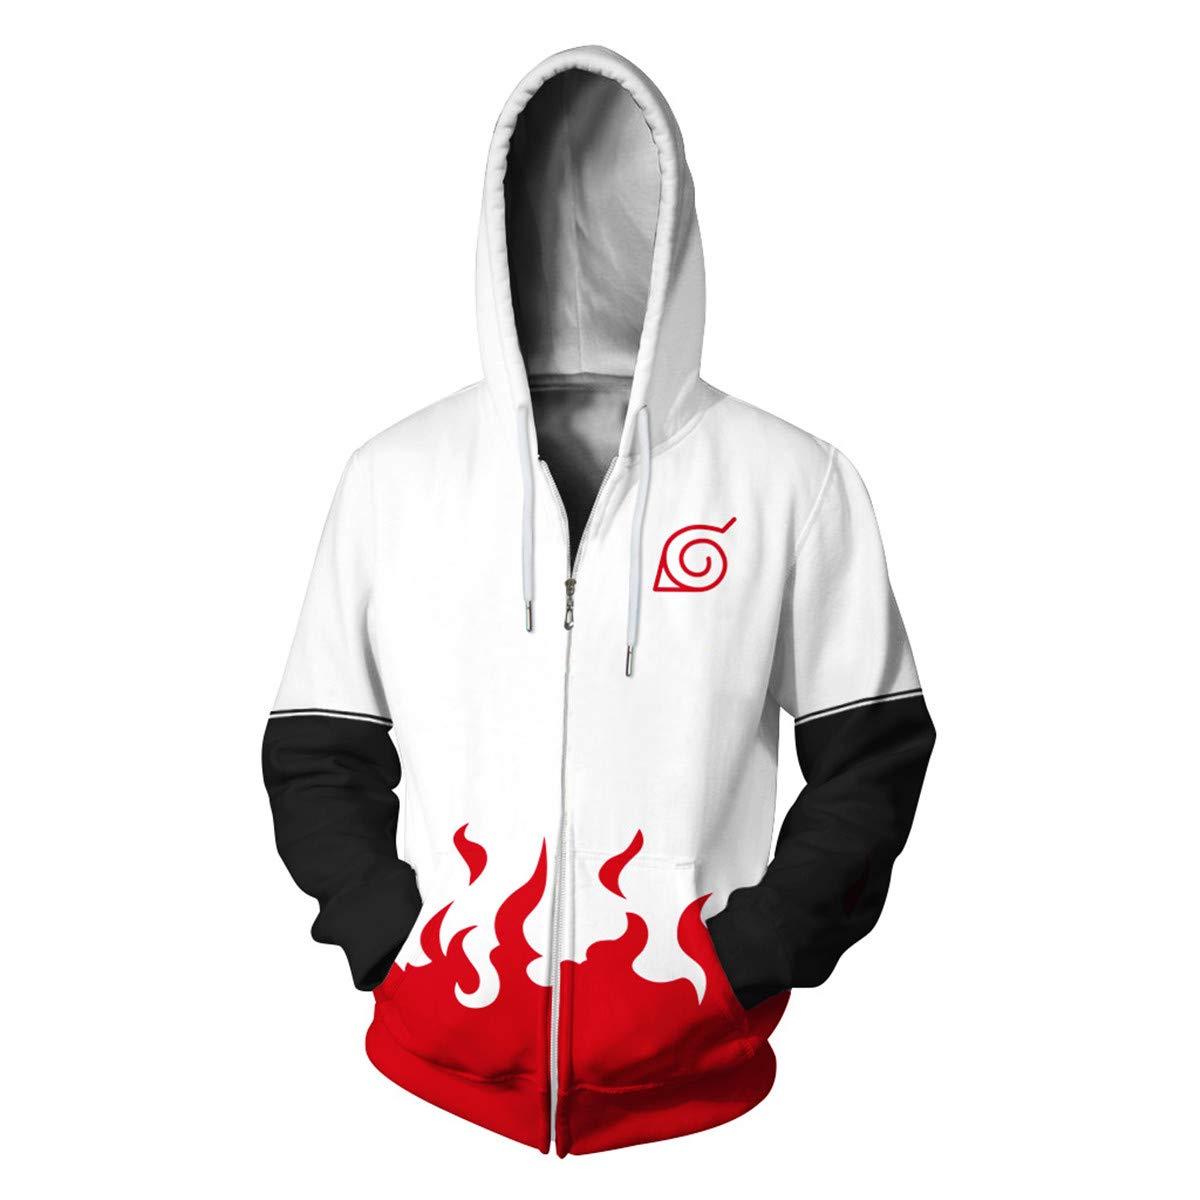 CHENMA Men Naruto Naruto Kakashi Long Sleeve Full-Zip Bomber Jacket Hooded Varsity Jacket (S/US XS, White) by CHENMA